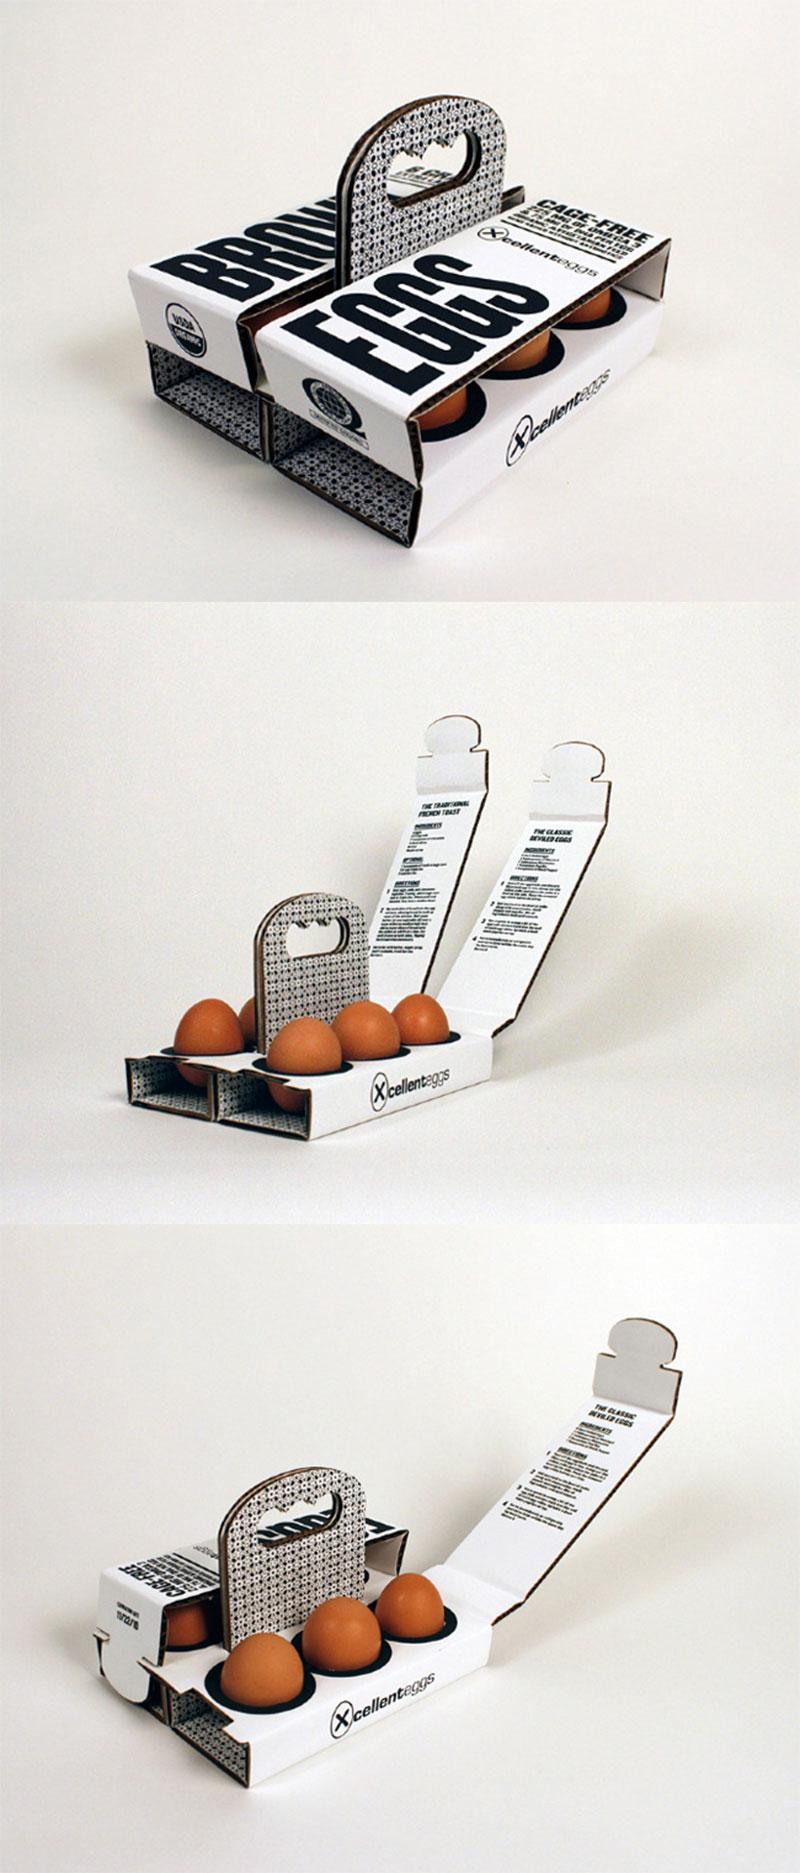 6 Brown Eggs (Concept) by Sarah Machicado